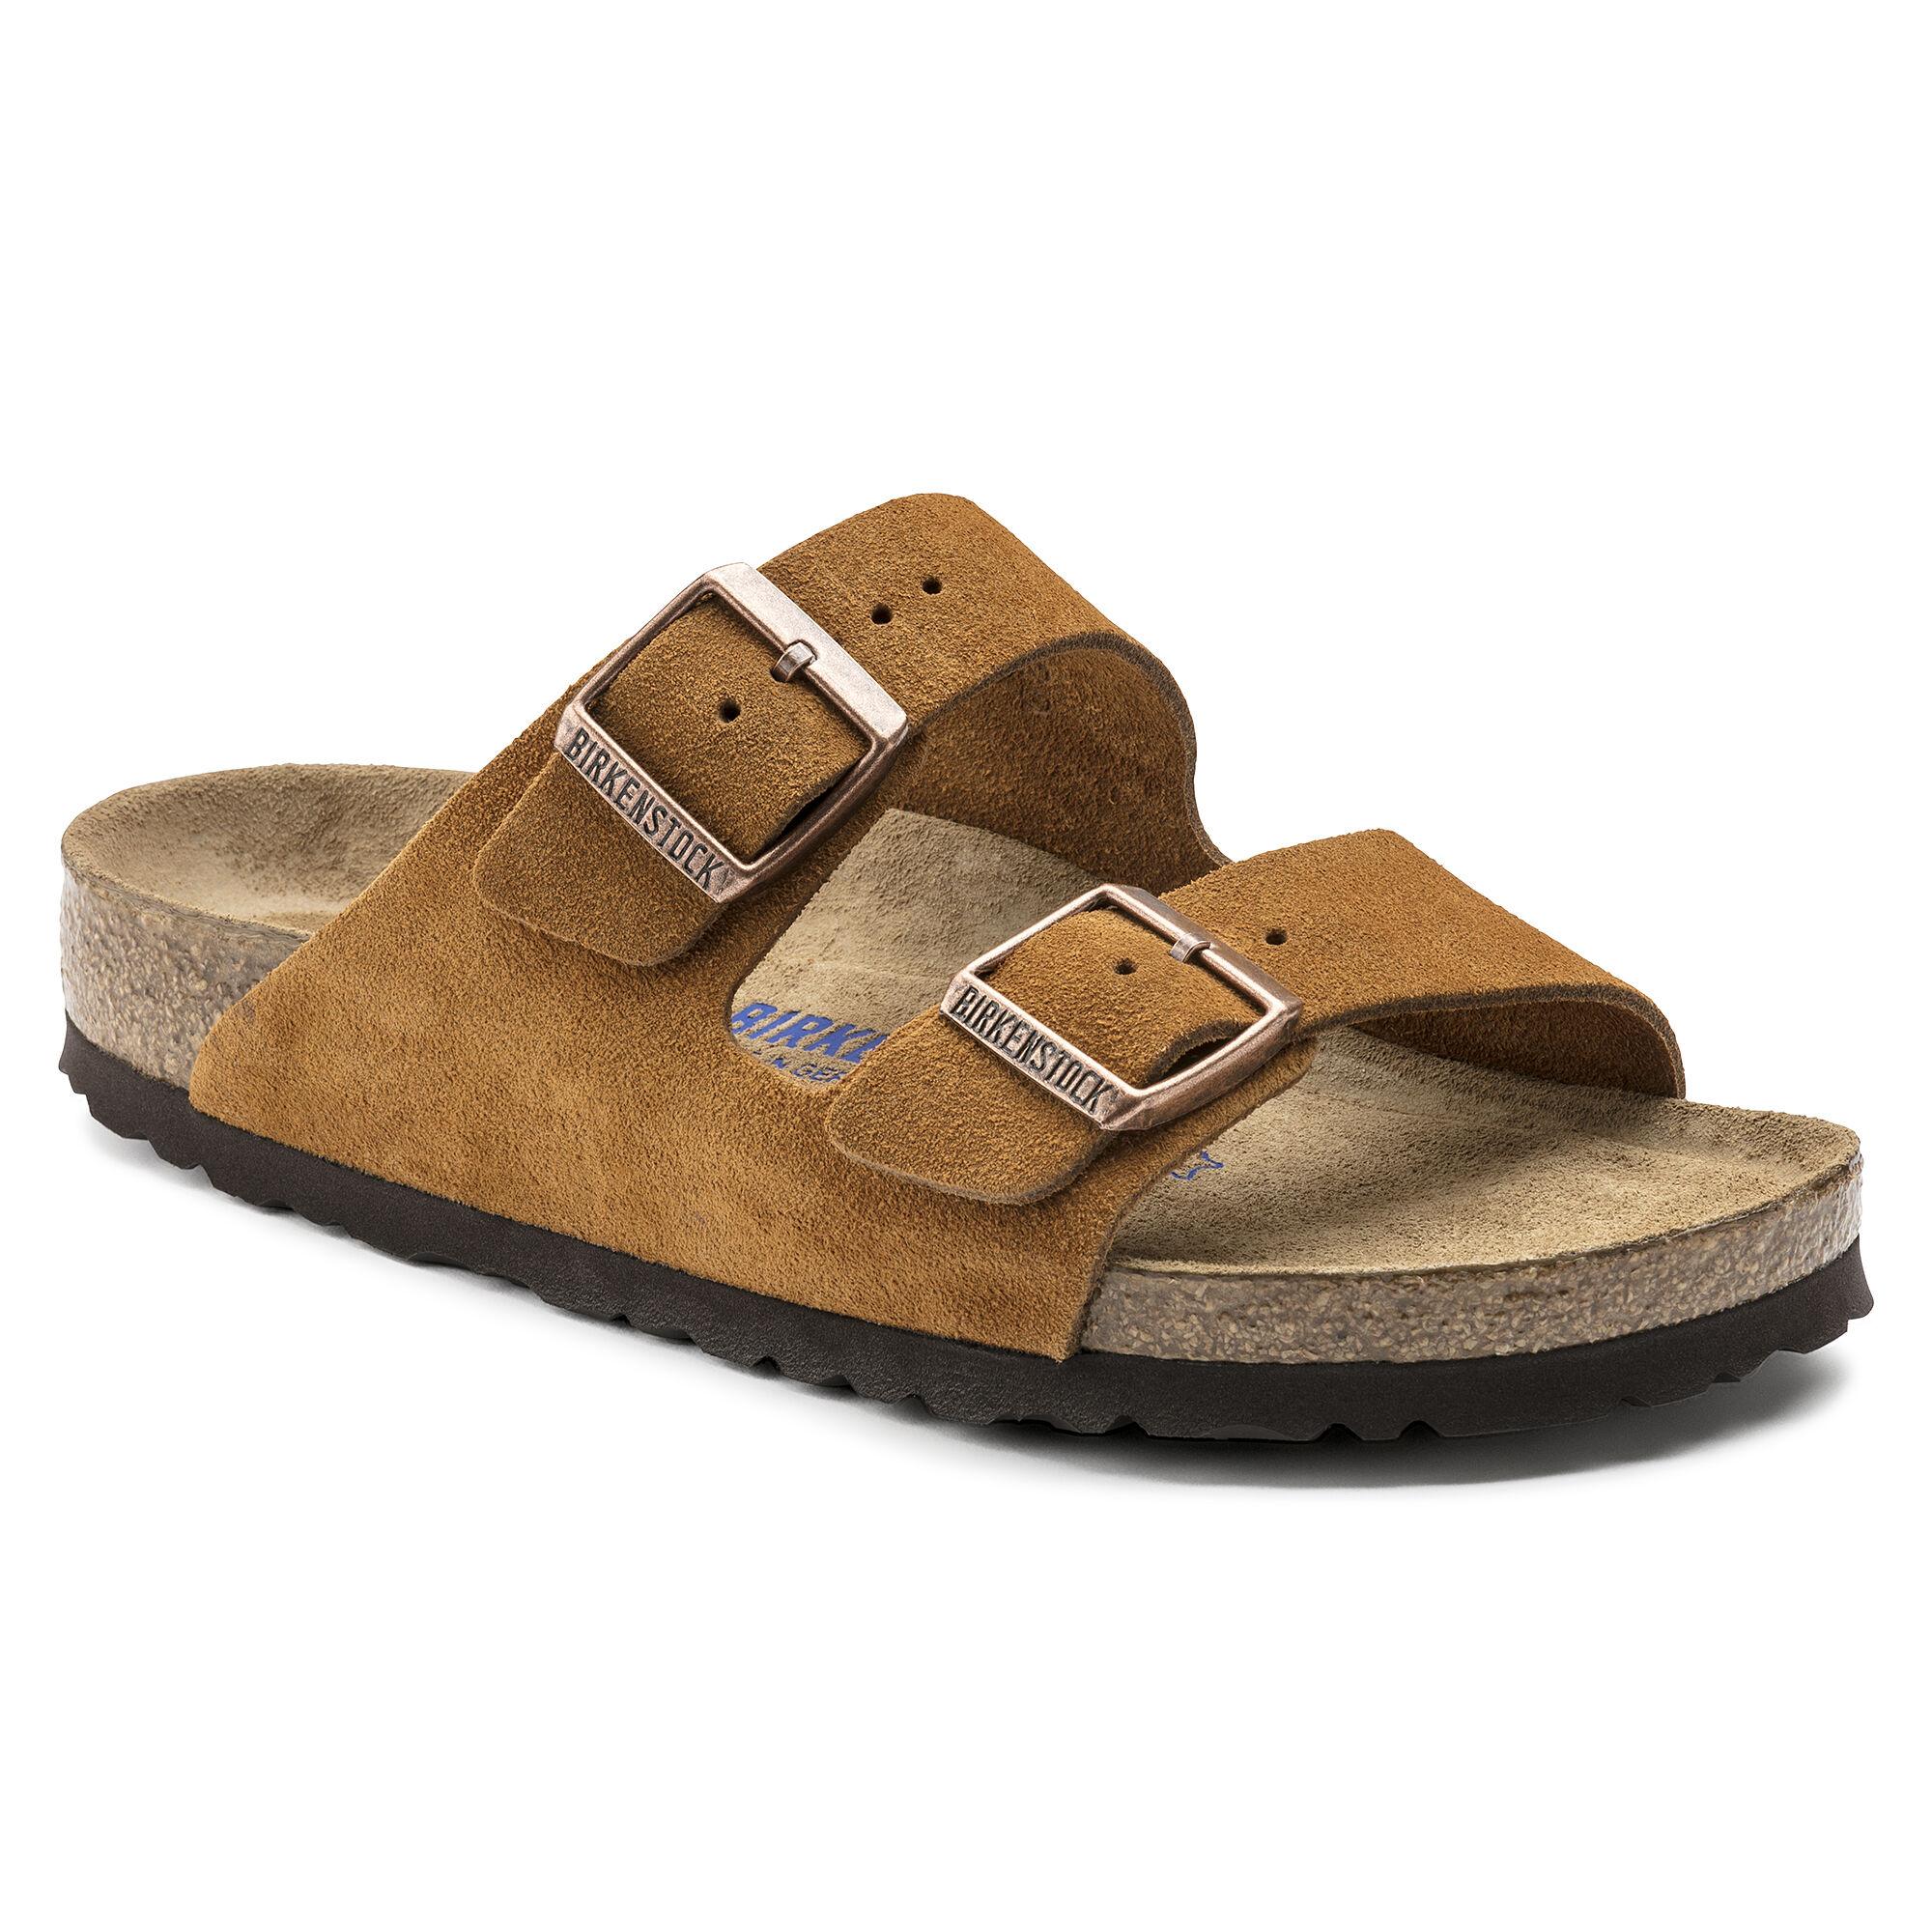 BIRKENSTOCK BIRKI'S NEPAL Vegan White Slides Mules Sandals